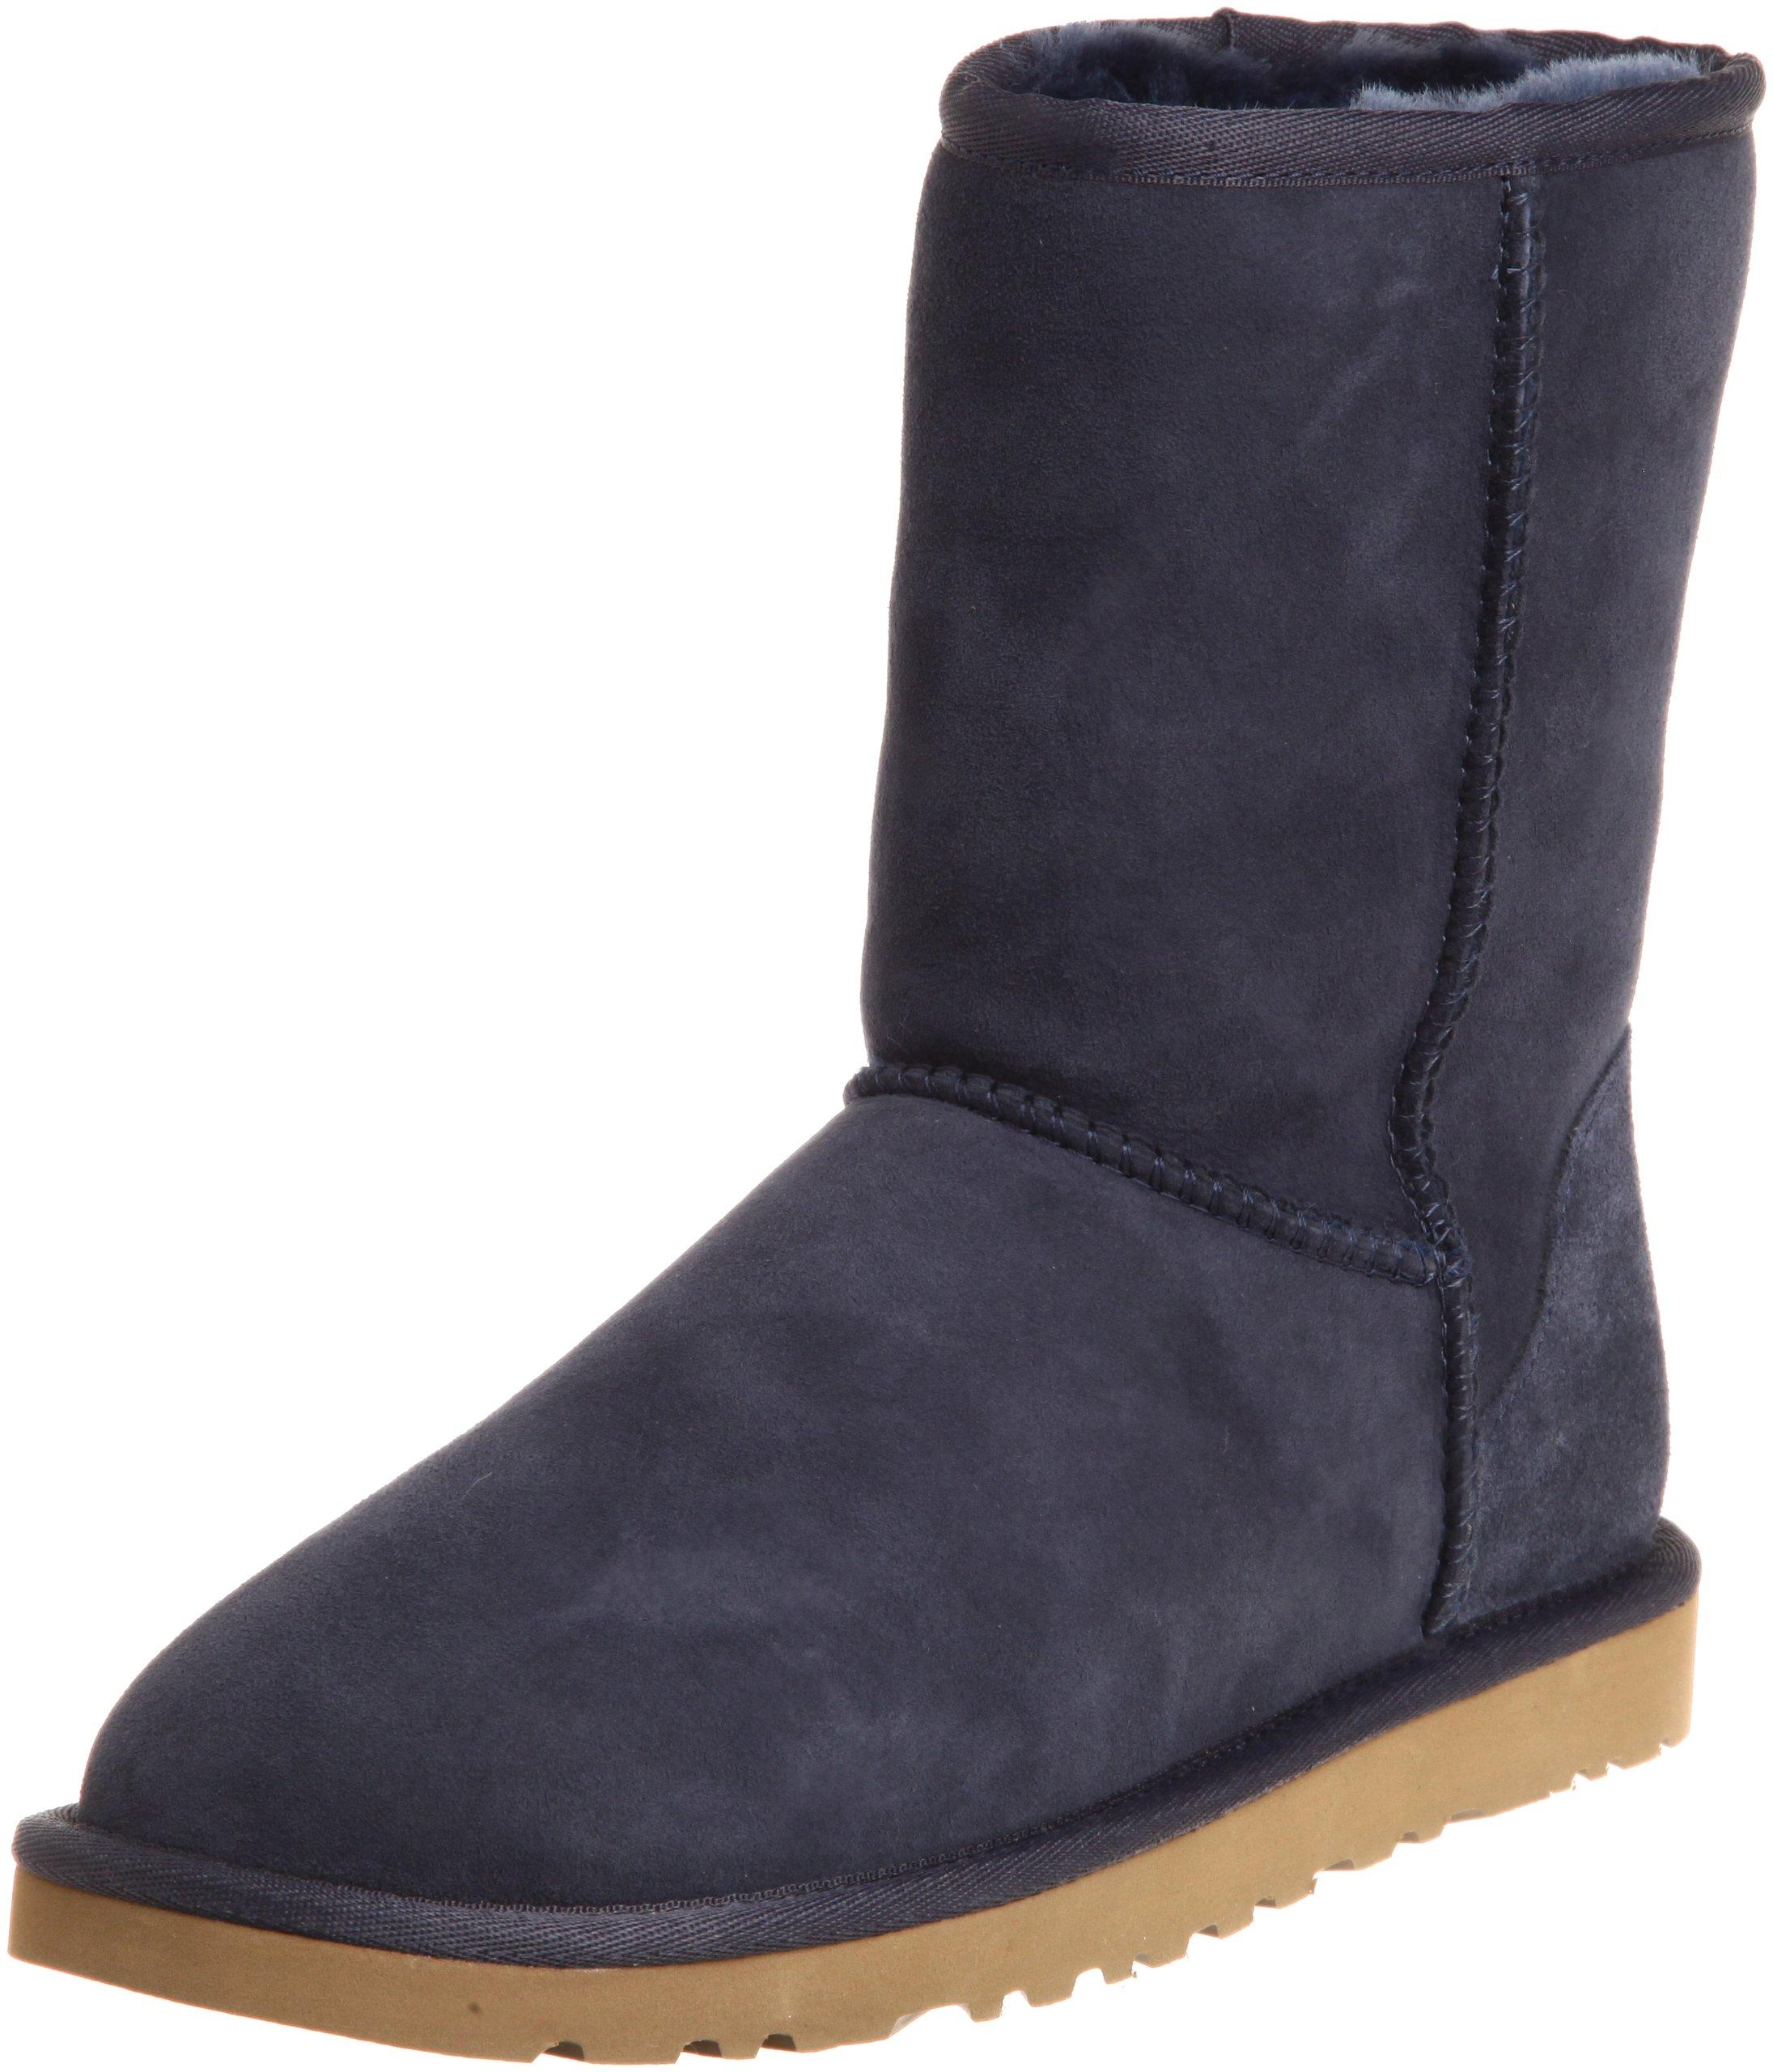 UGG Women's Classic Short Sheepskin Boots